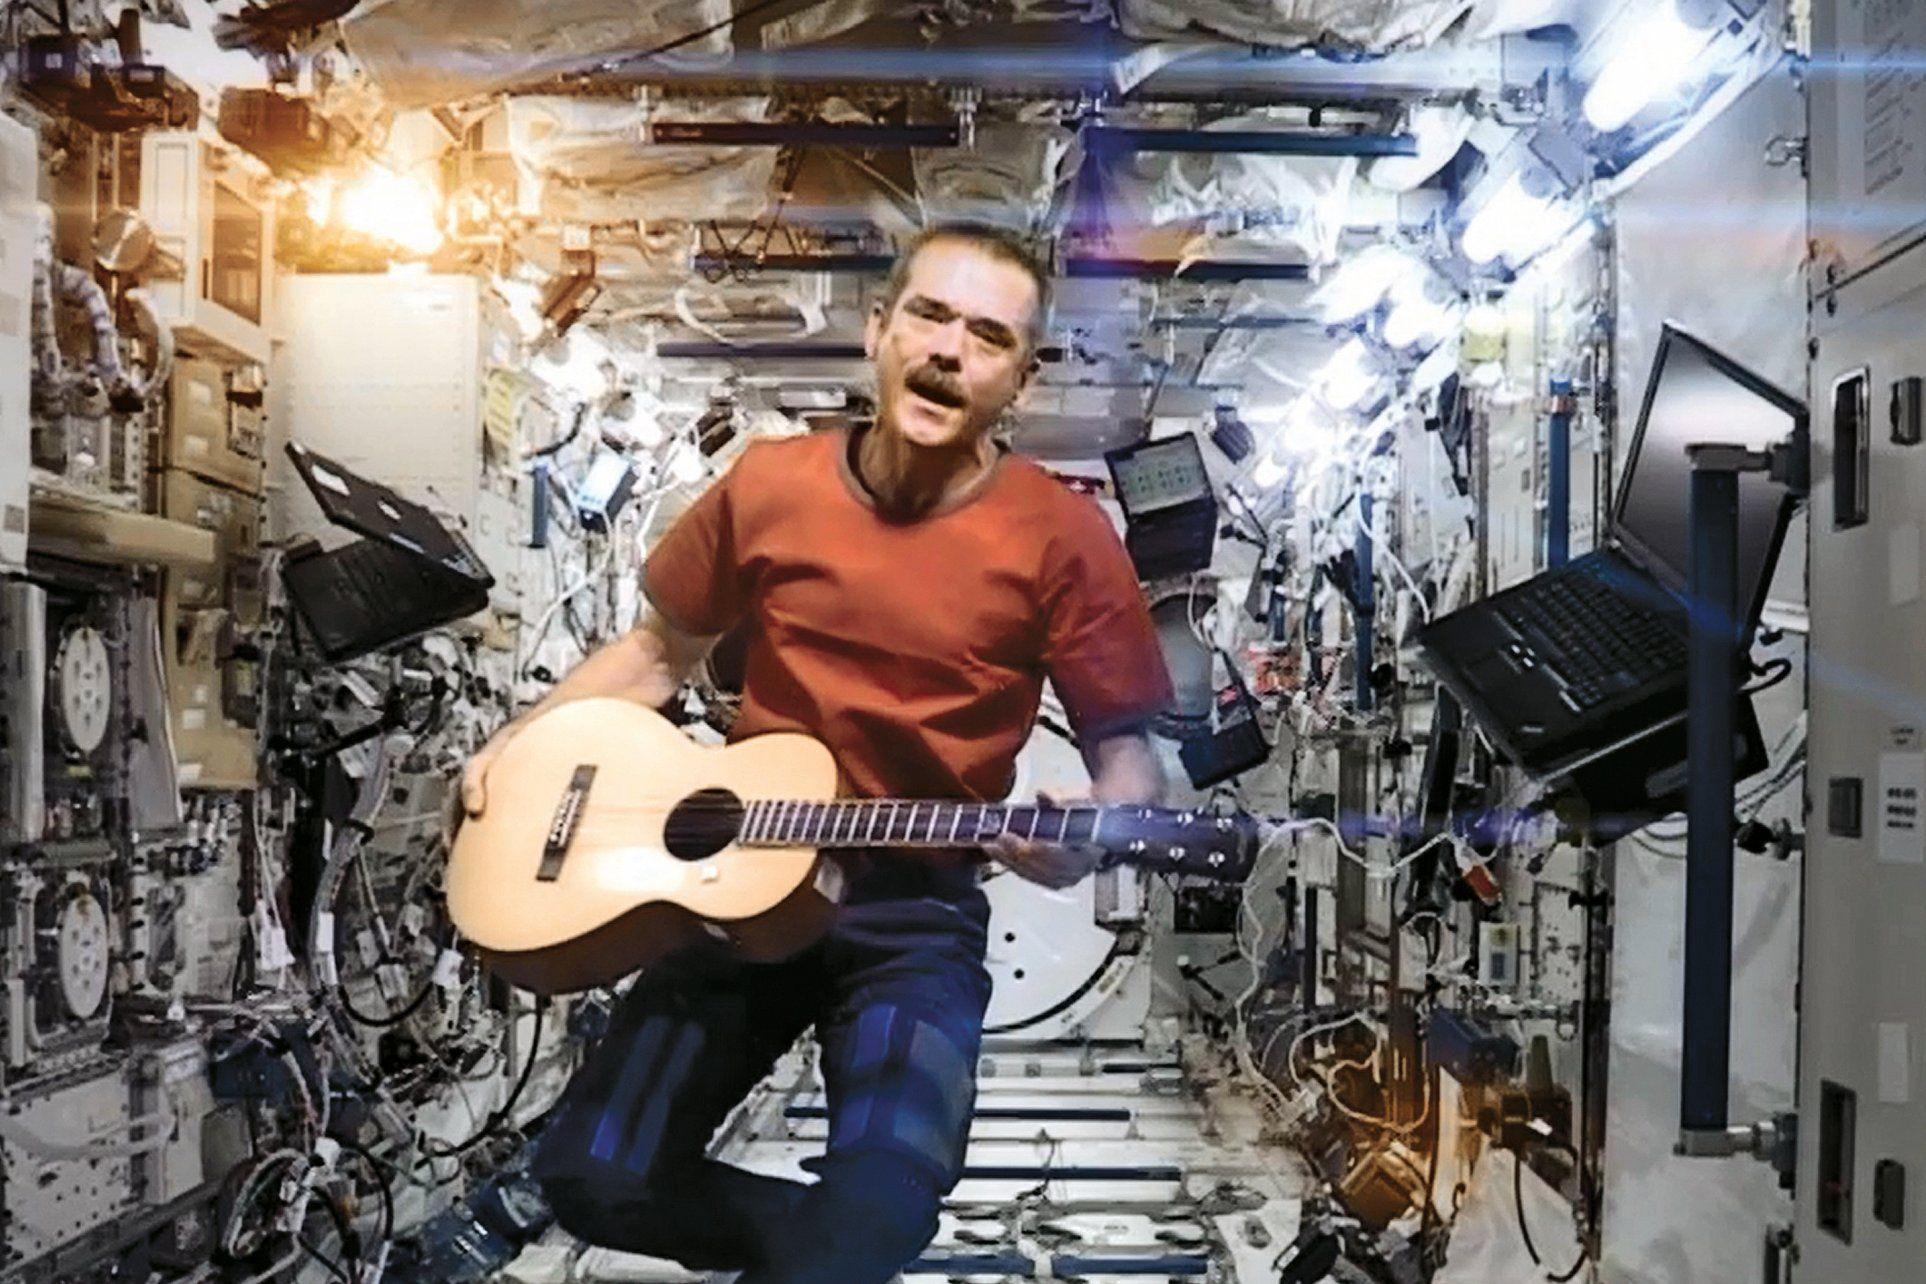 130513-astronaut-video-tease